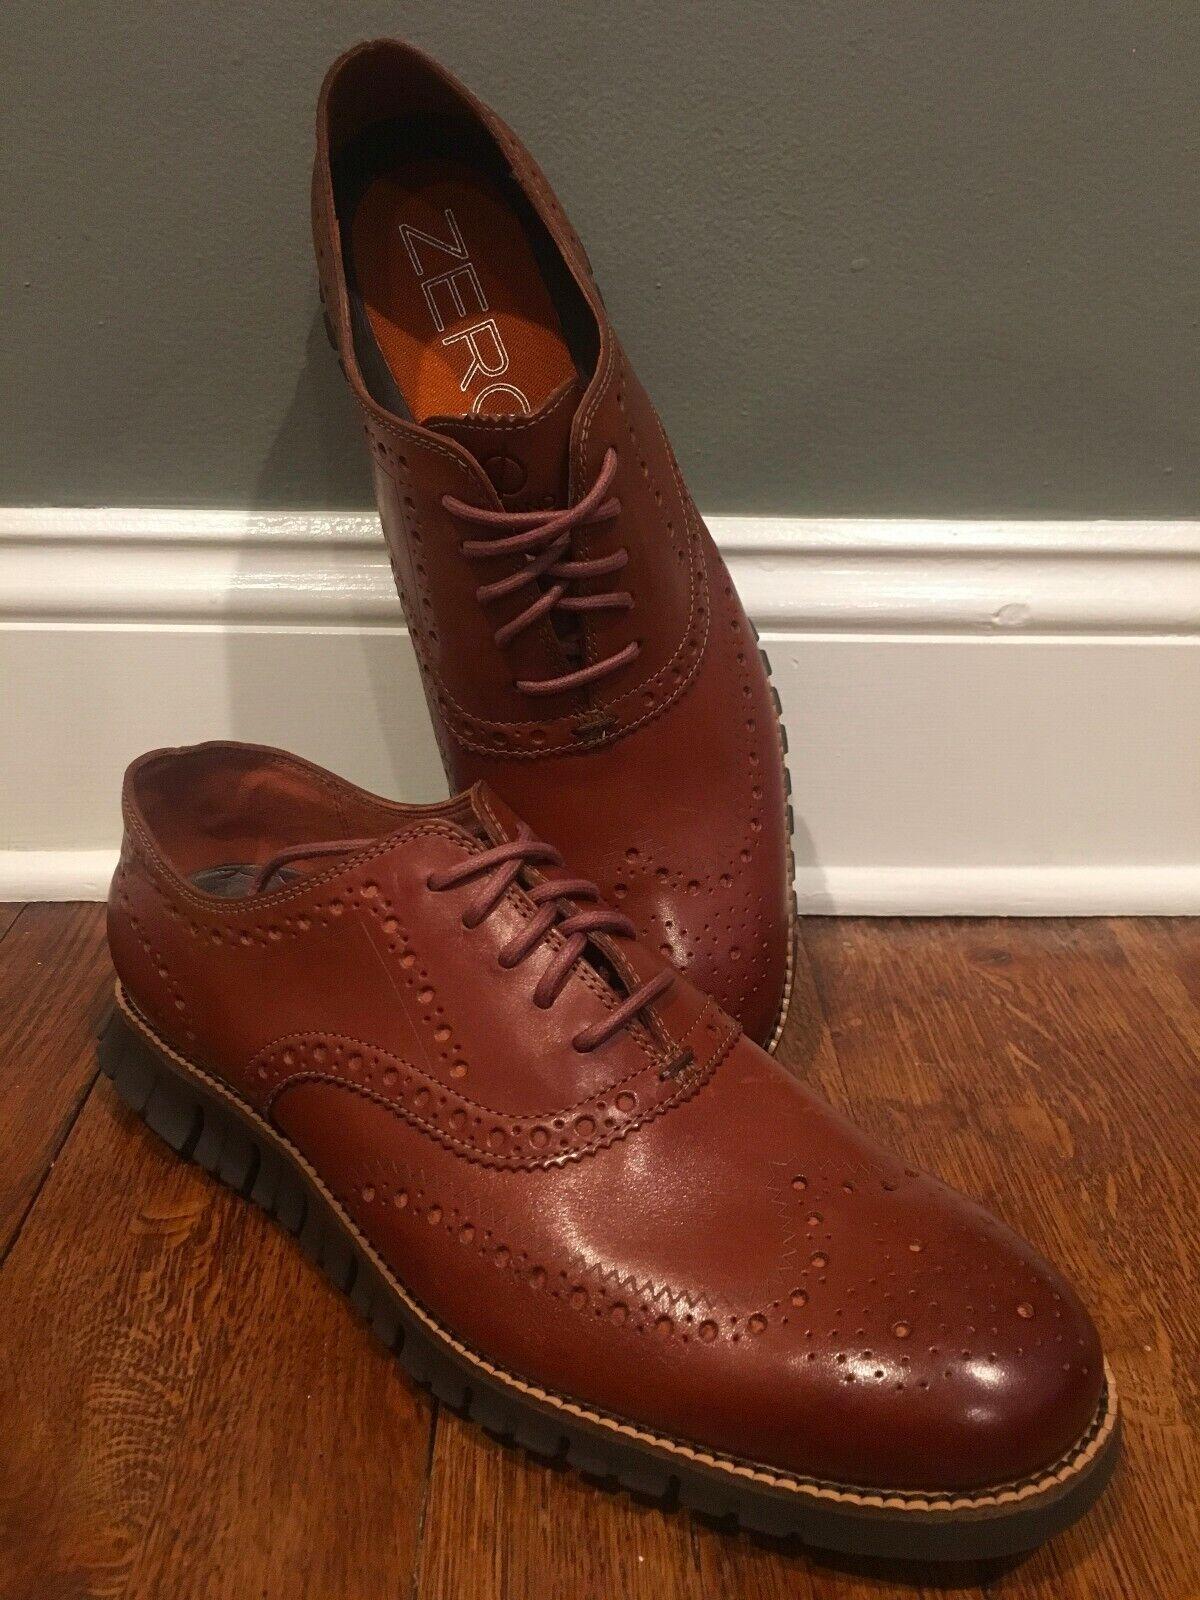 Cole Haan ZeroGrand Wingtip Oxfords British Tan Java Leather C29411 Men Size 10